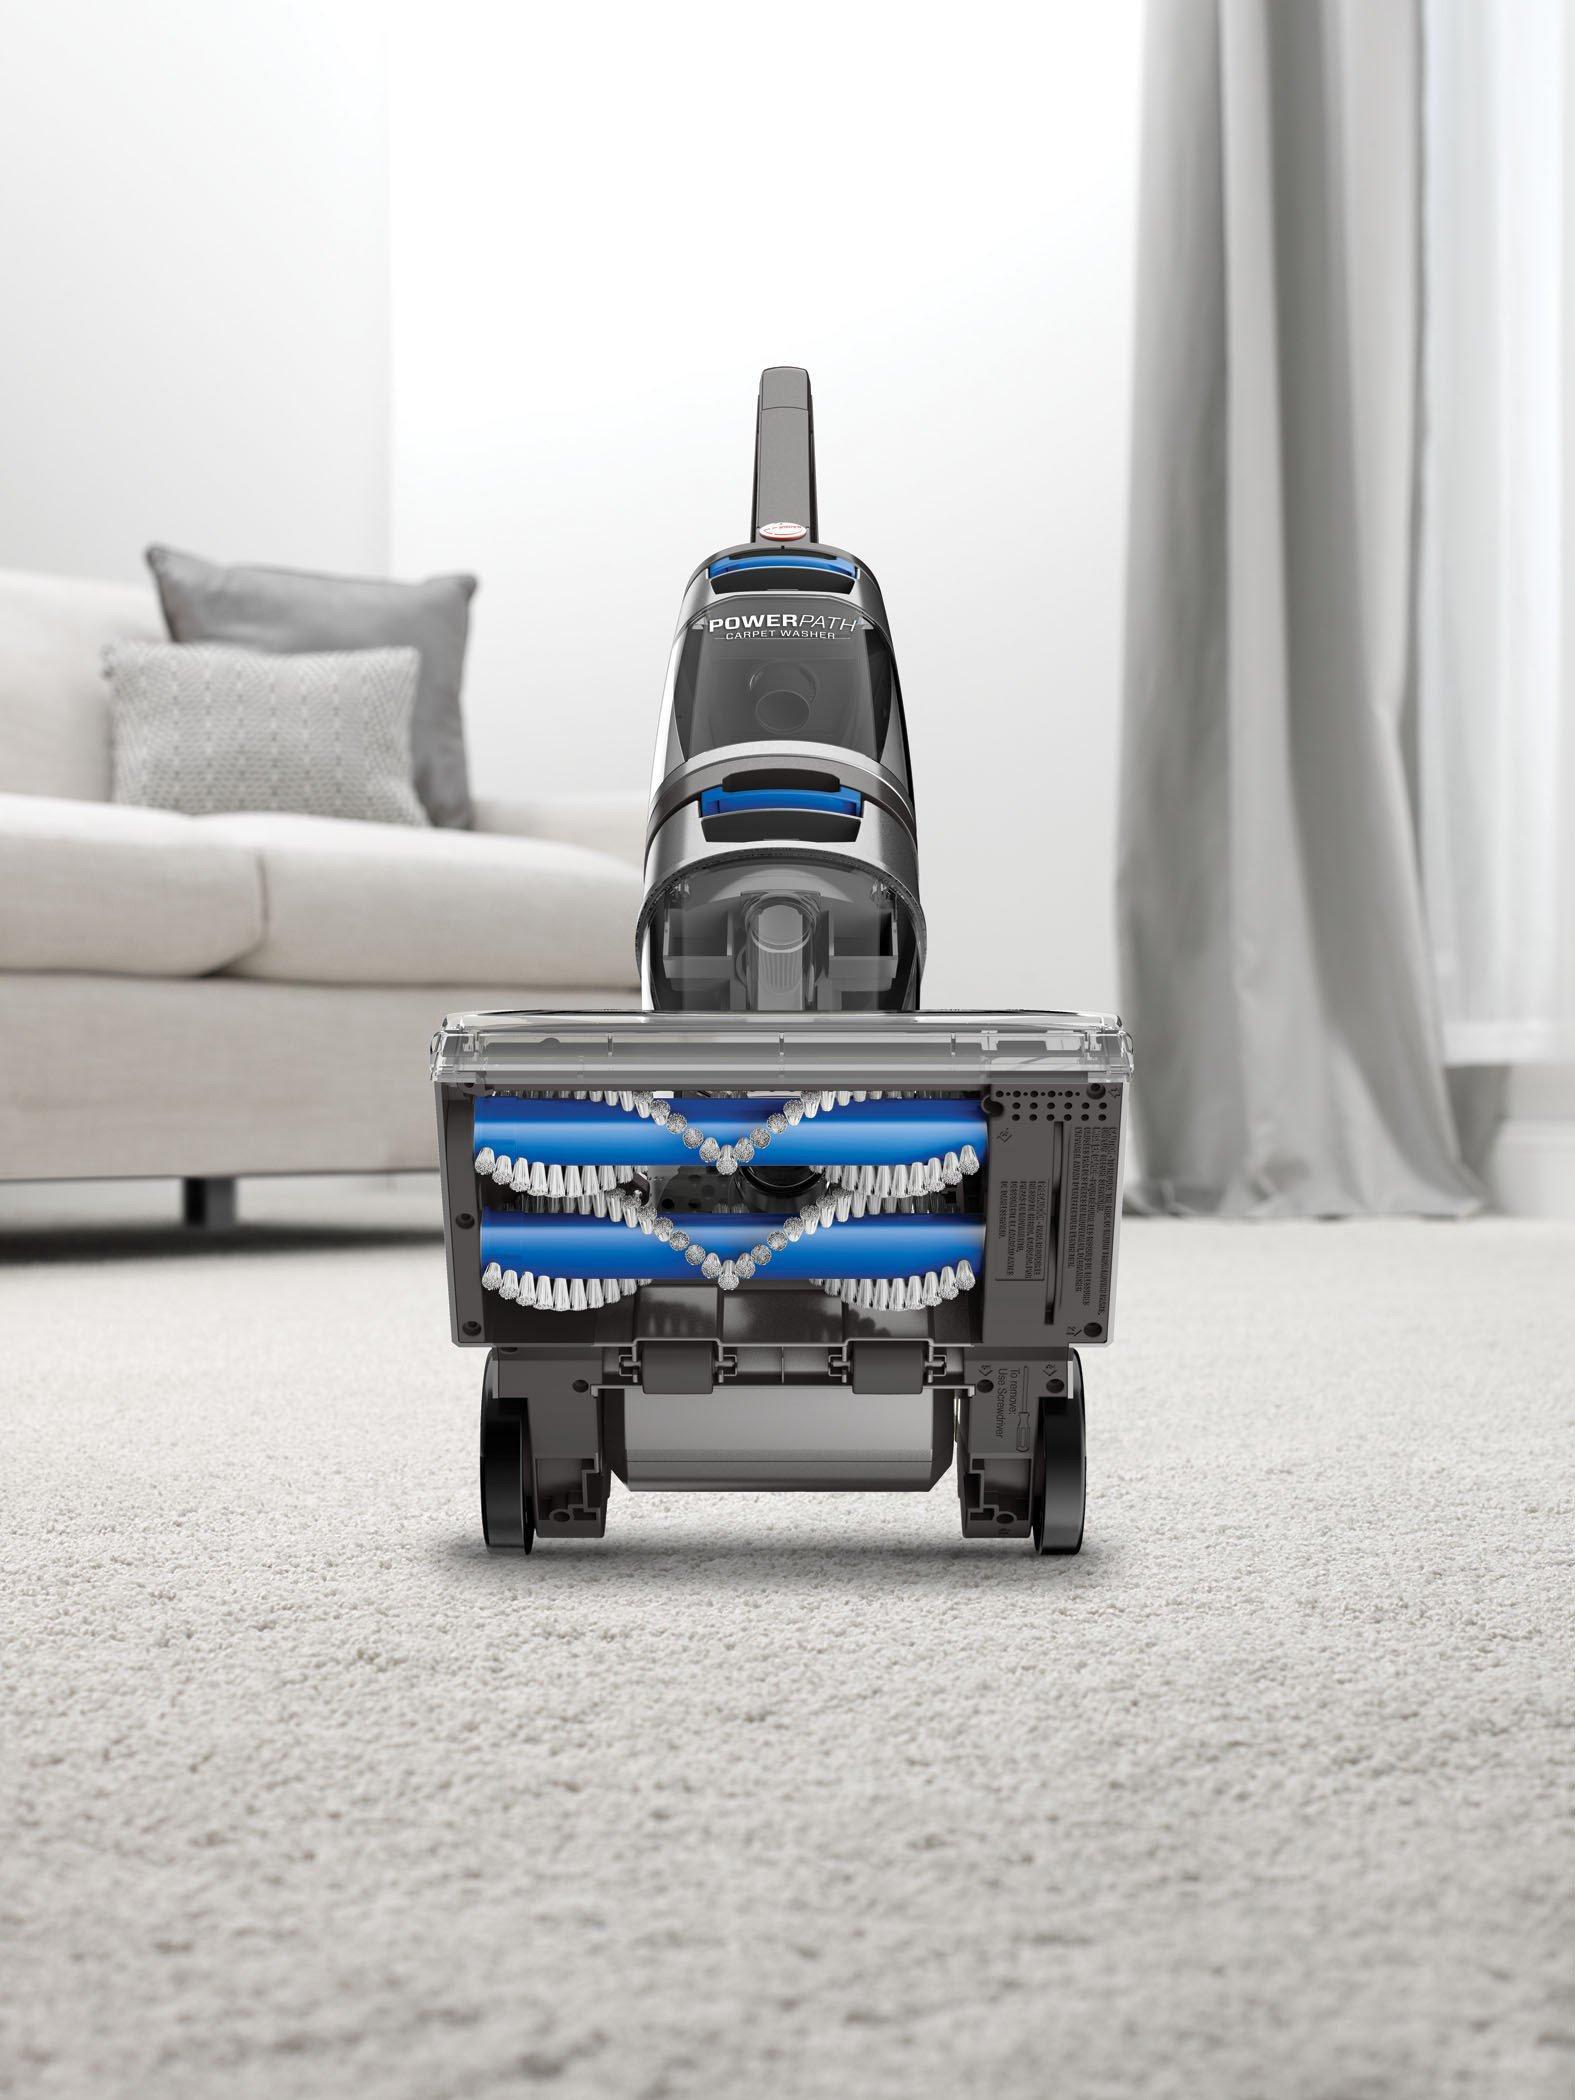 HOOVER POWERPATH Carpet Cleaner Refurbished FH50950RM